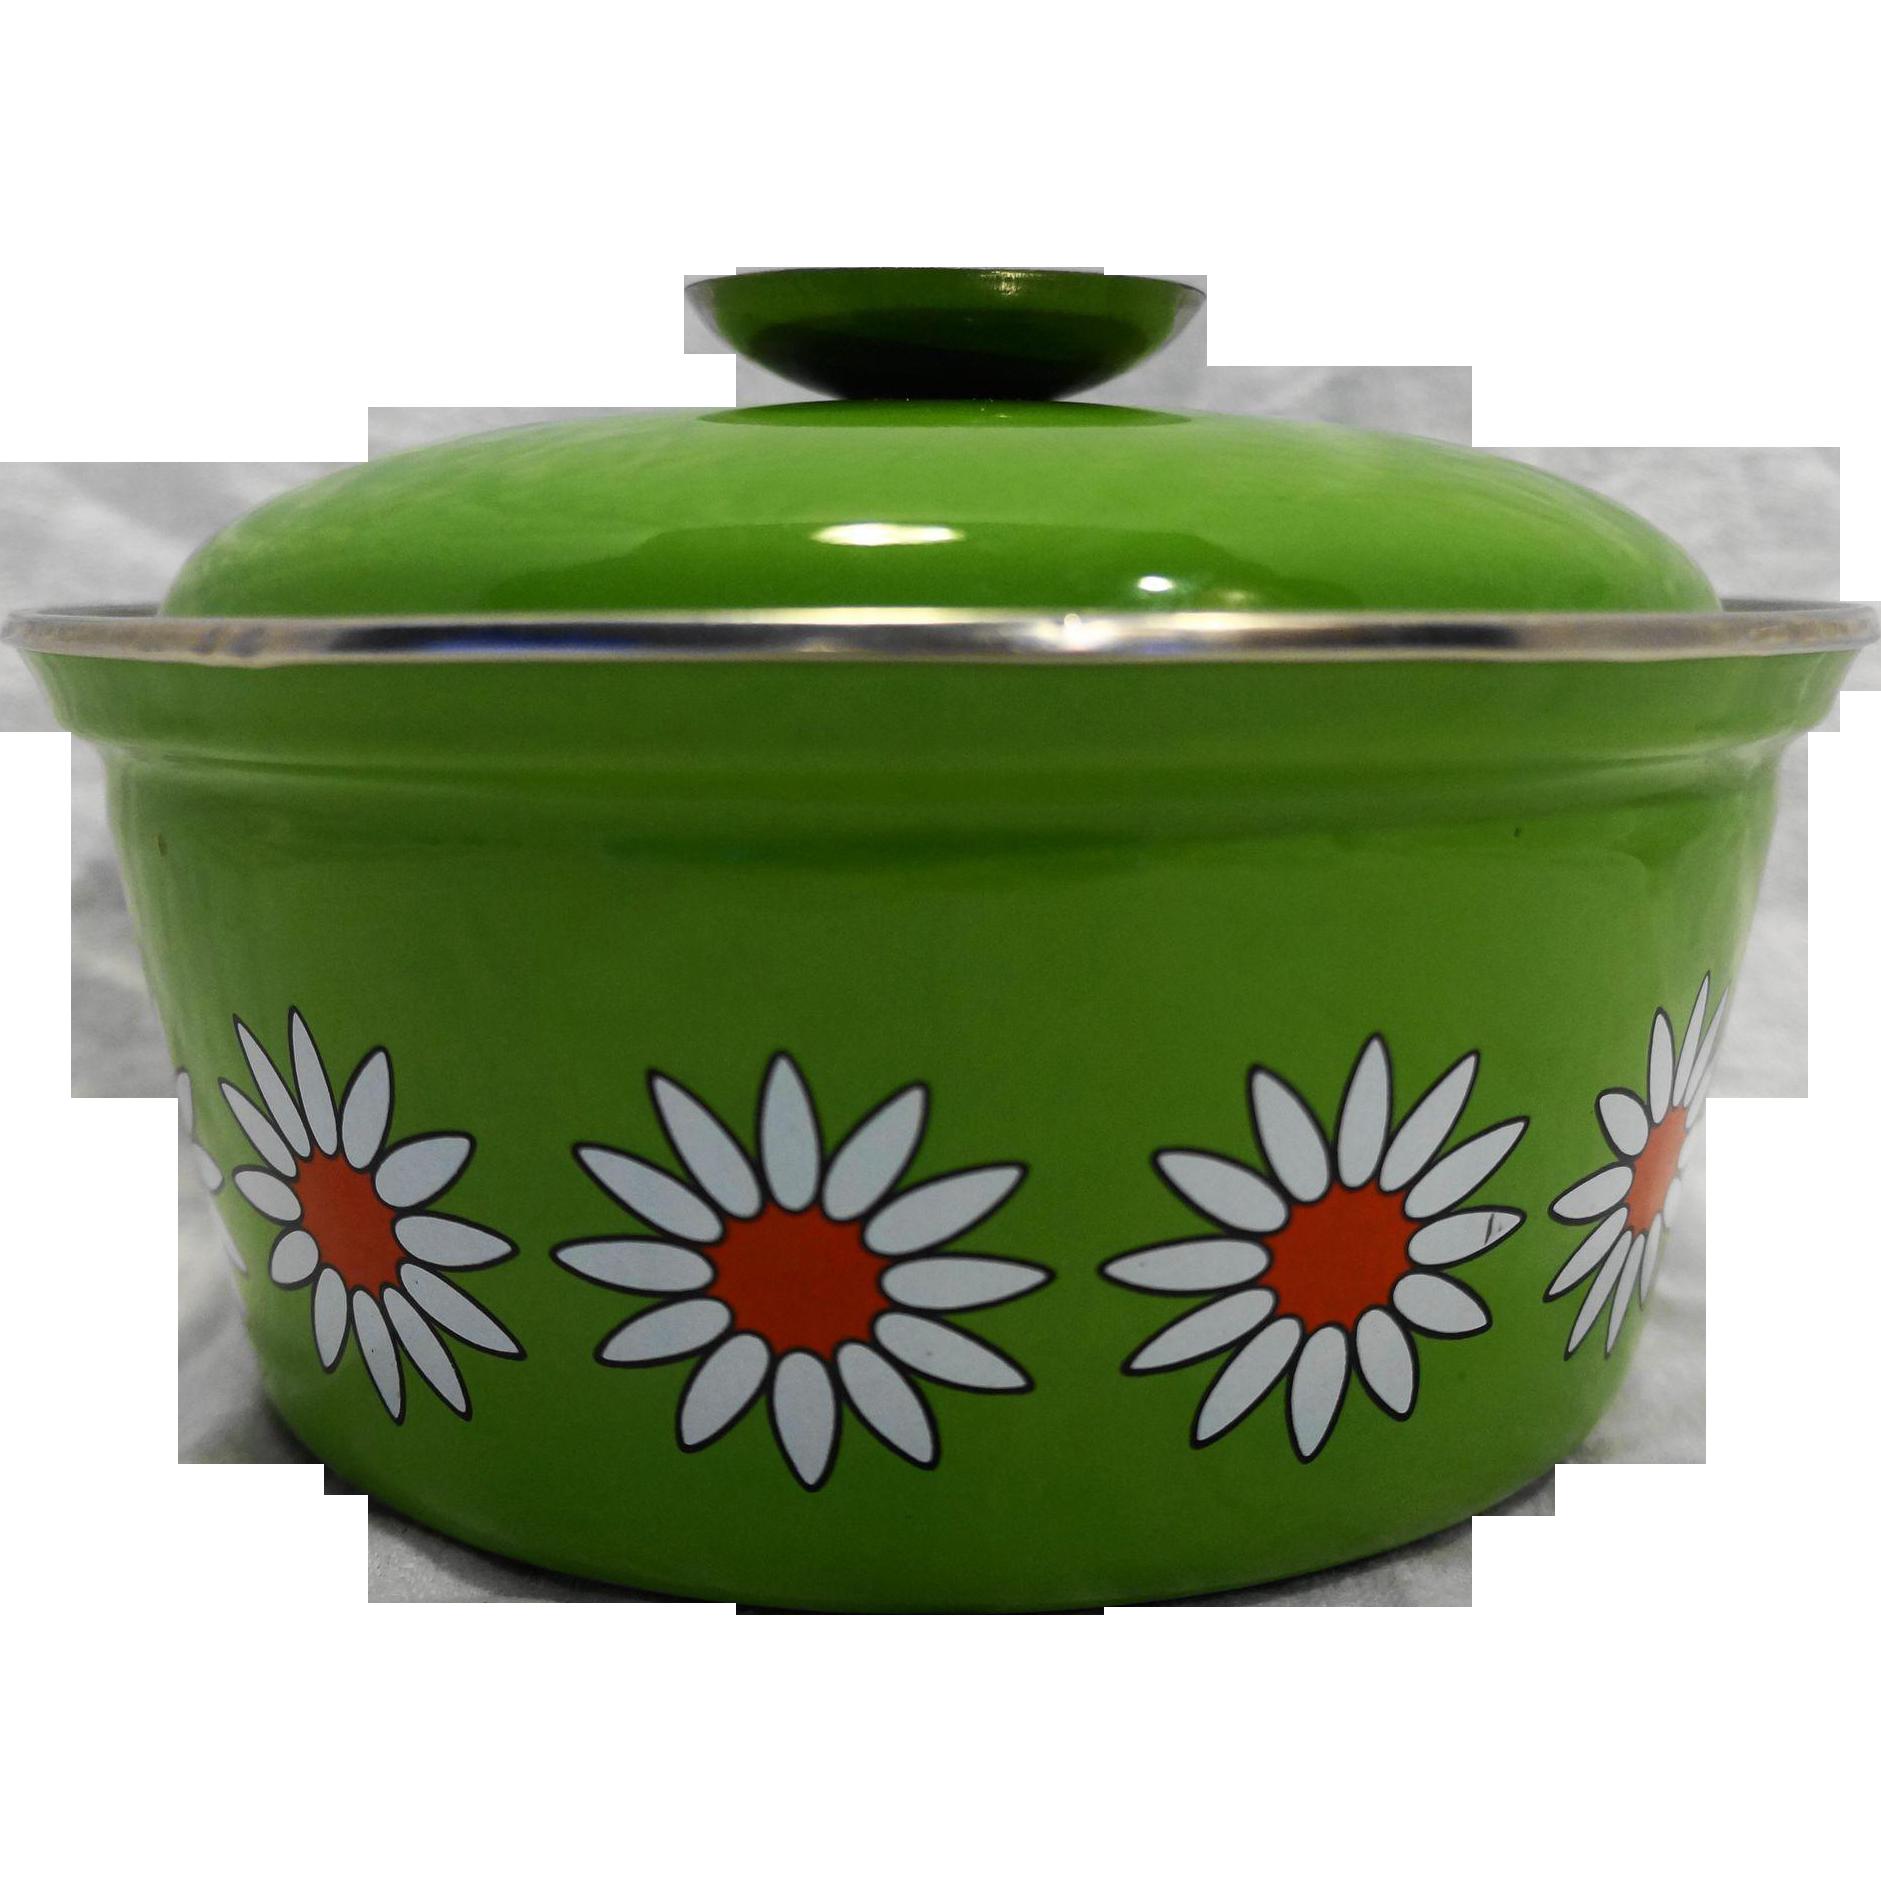 Spring Green Enamel Small Dutch Oven Pot Flower Power Daisies White Orange